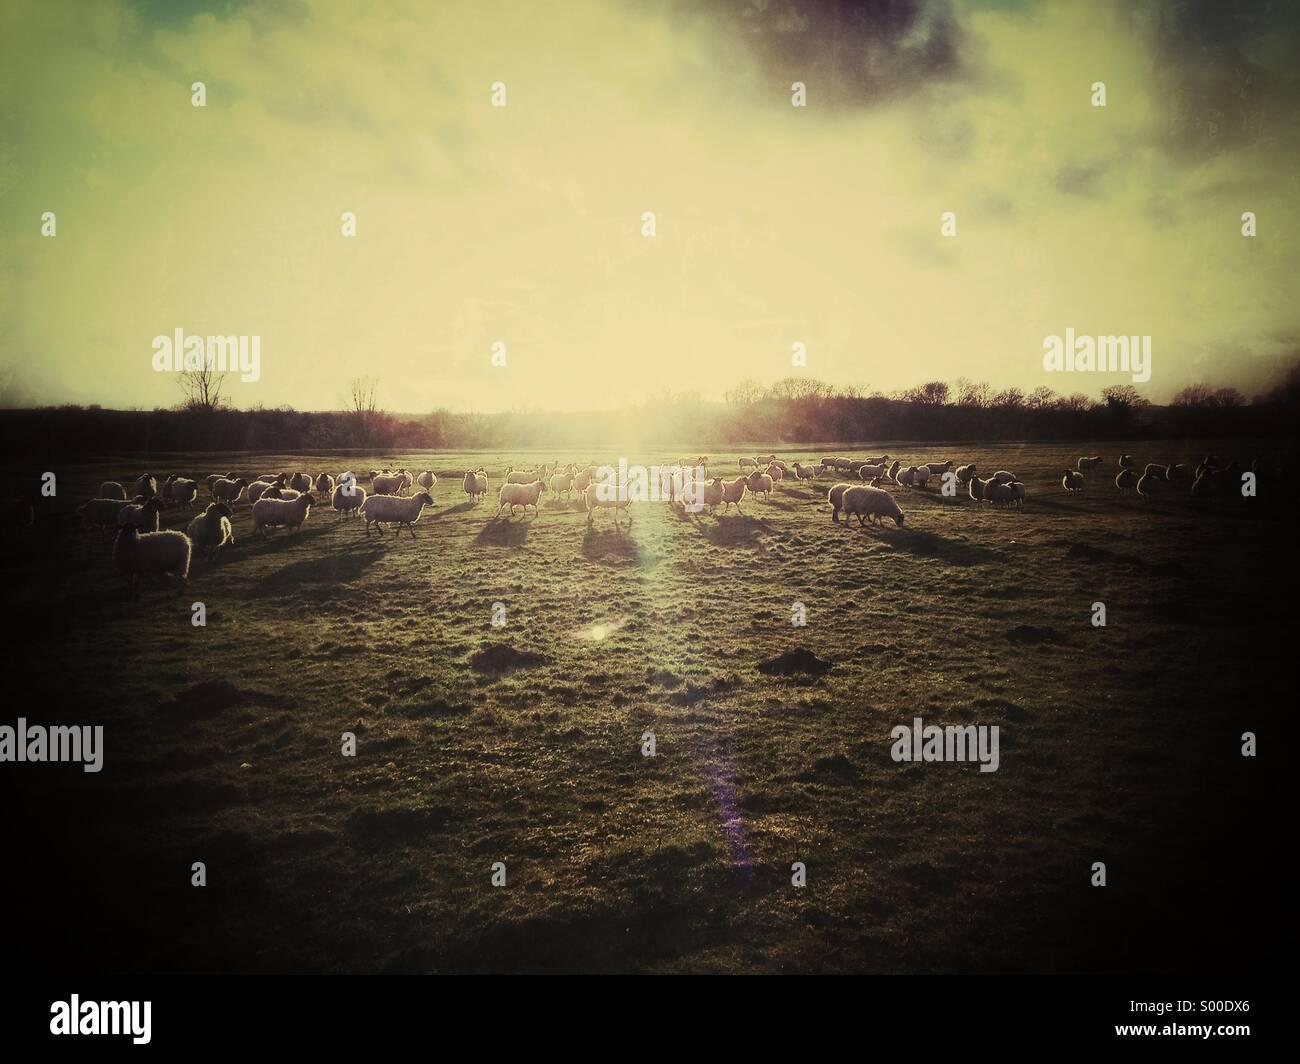 Schafe im Feld suchen in Sonne Stockbild